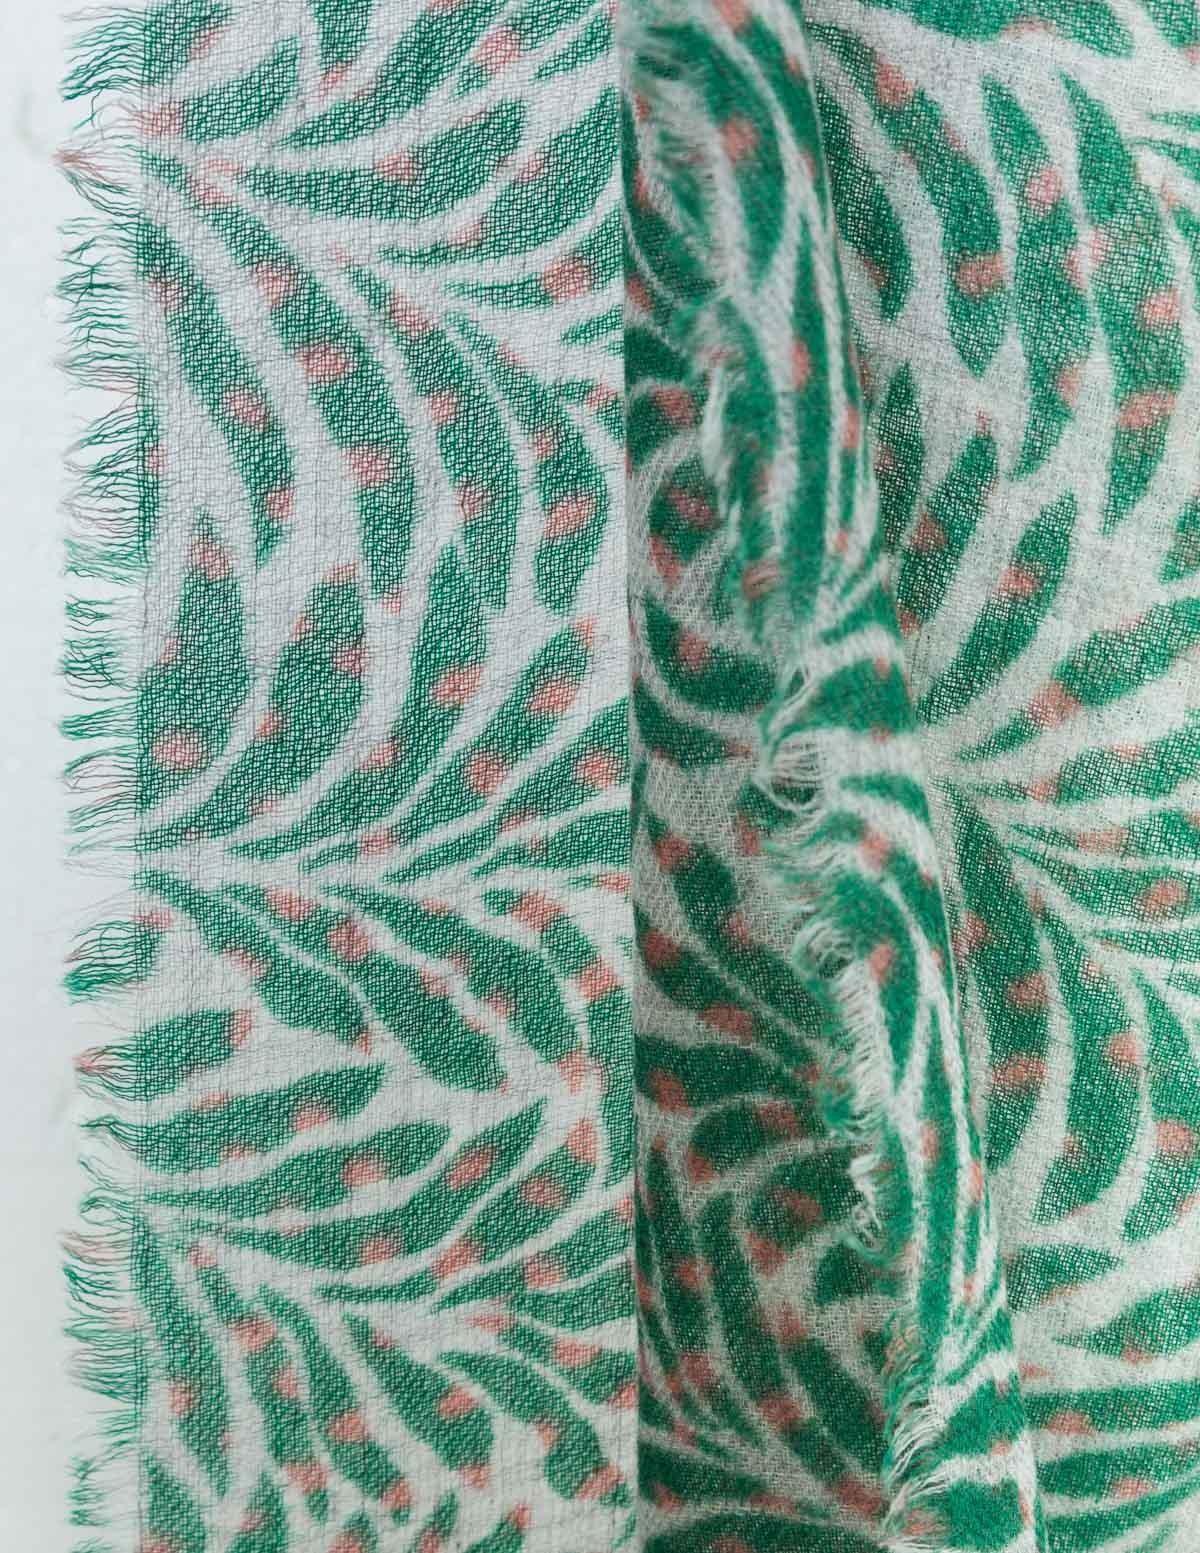 Fular estampado hojas - Ítem1